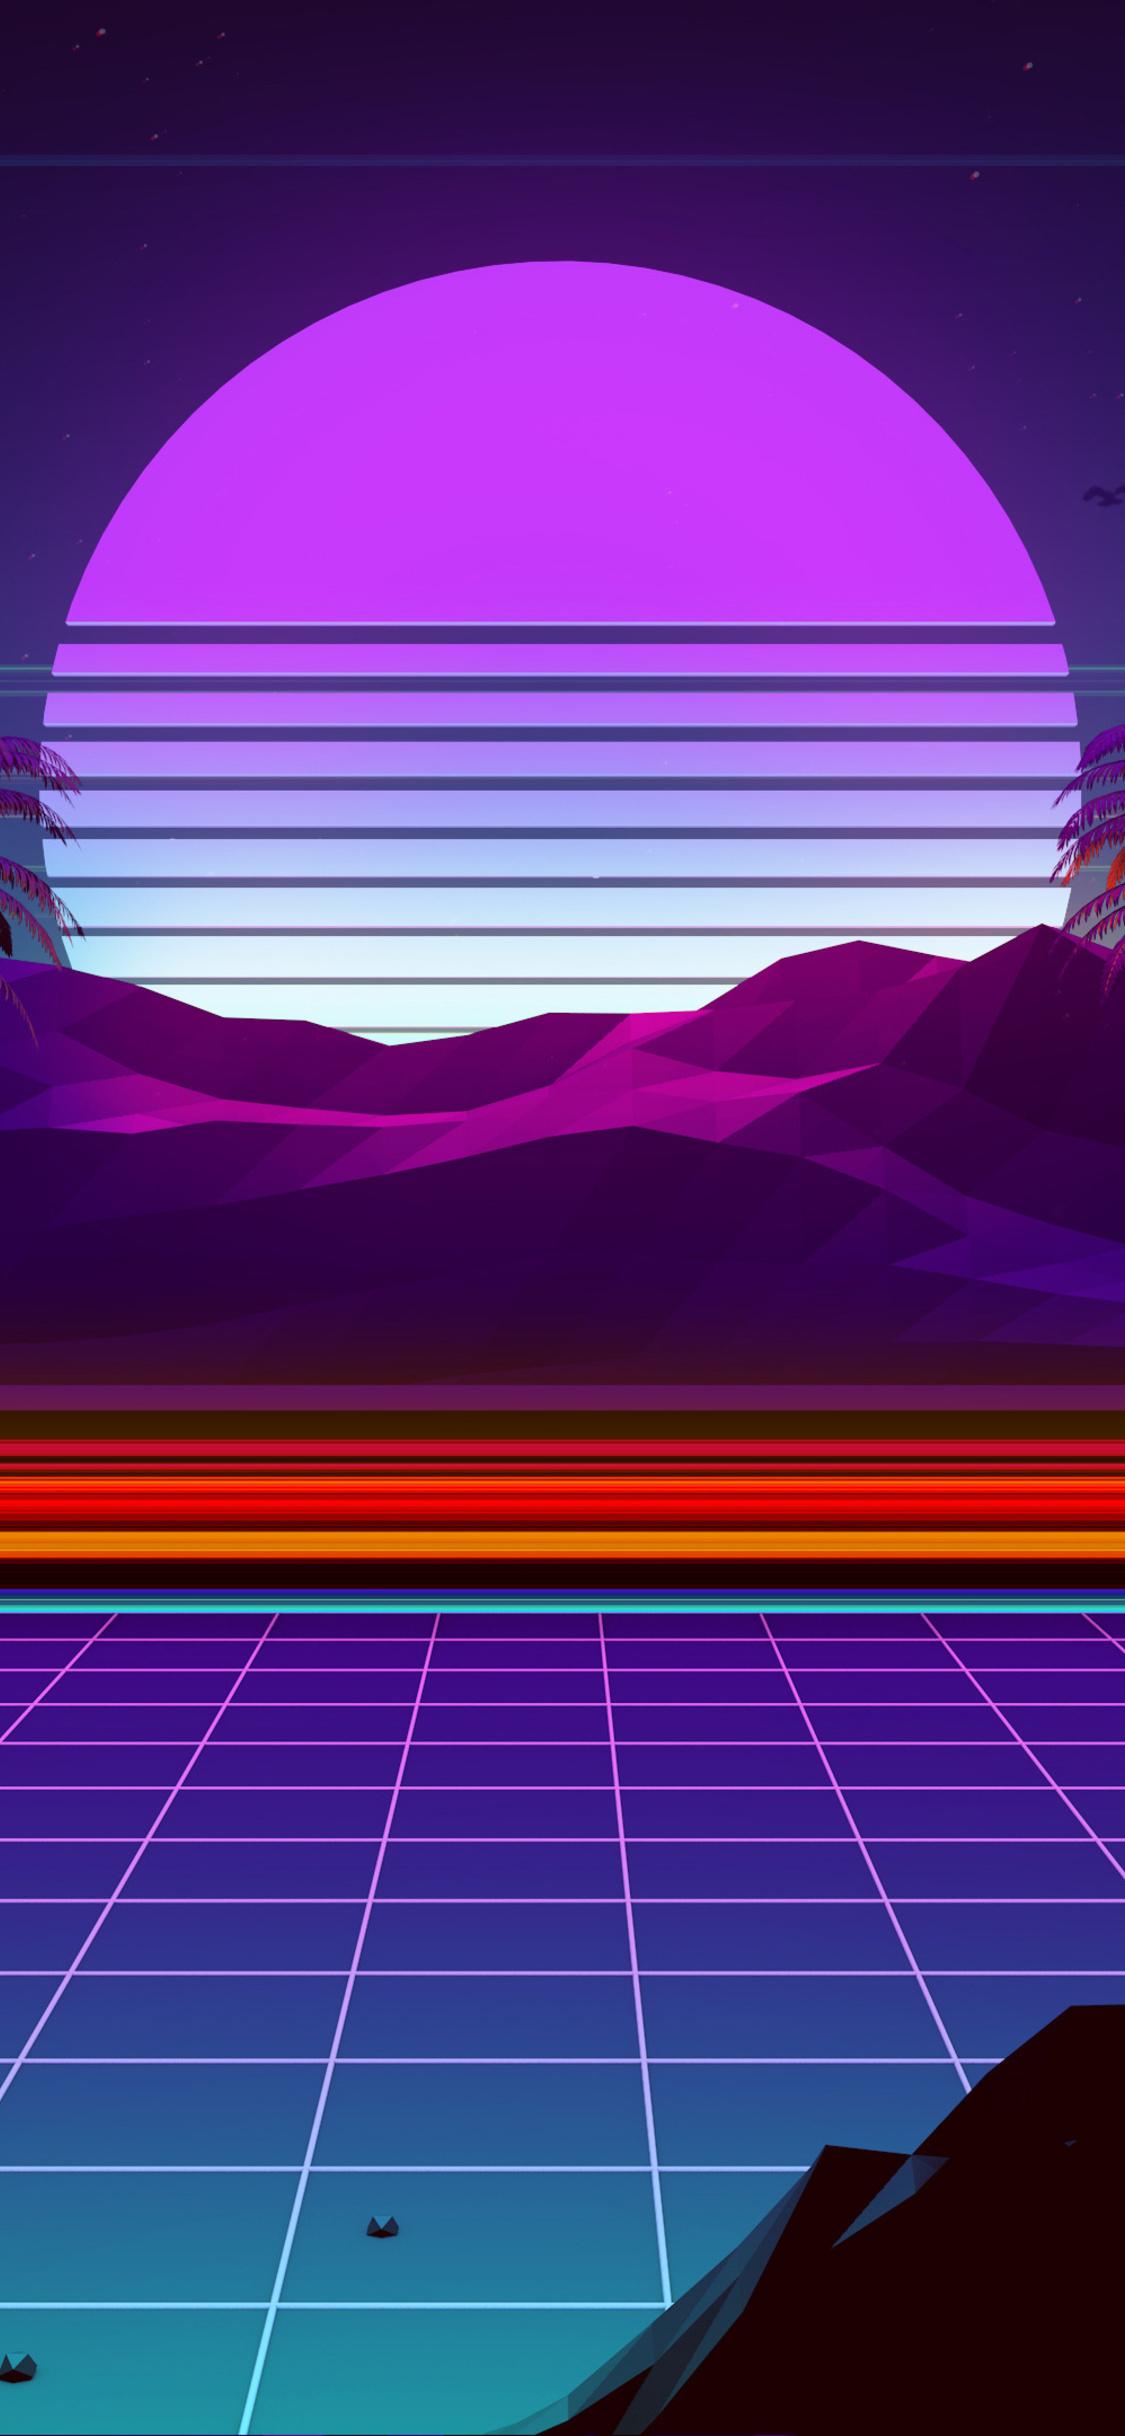 retro-wave-4k-zx.jpg